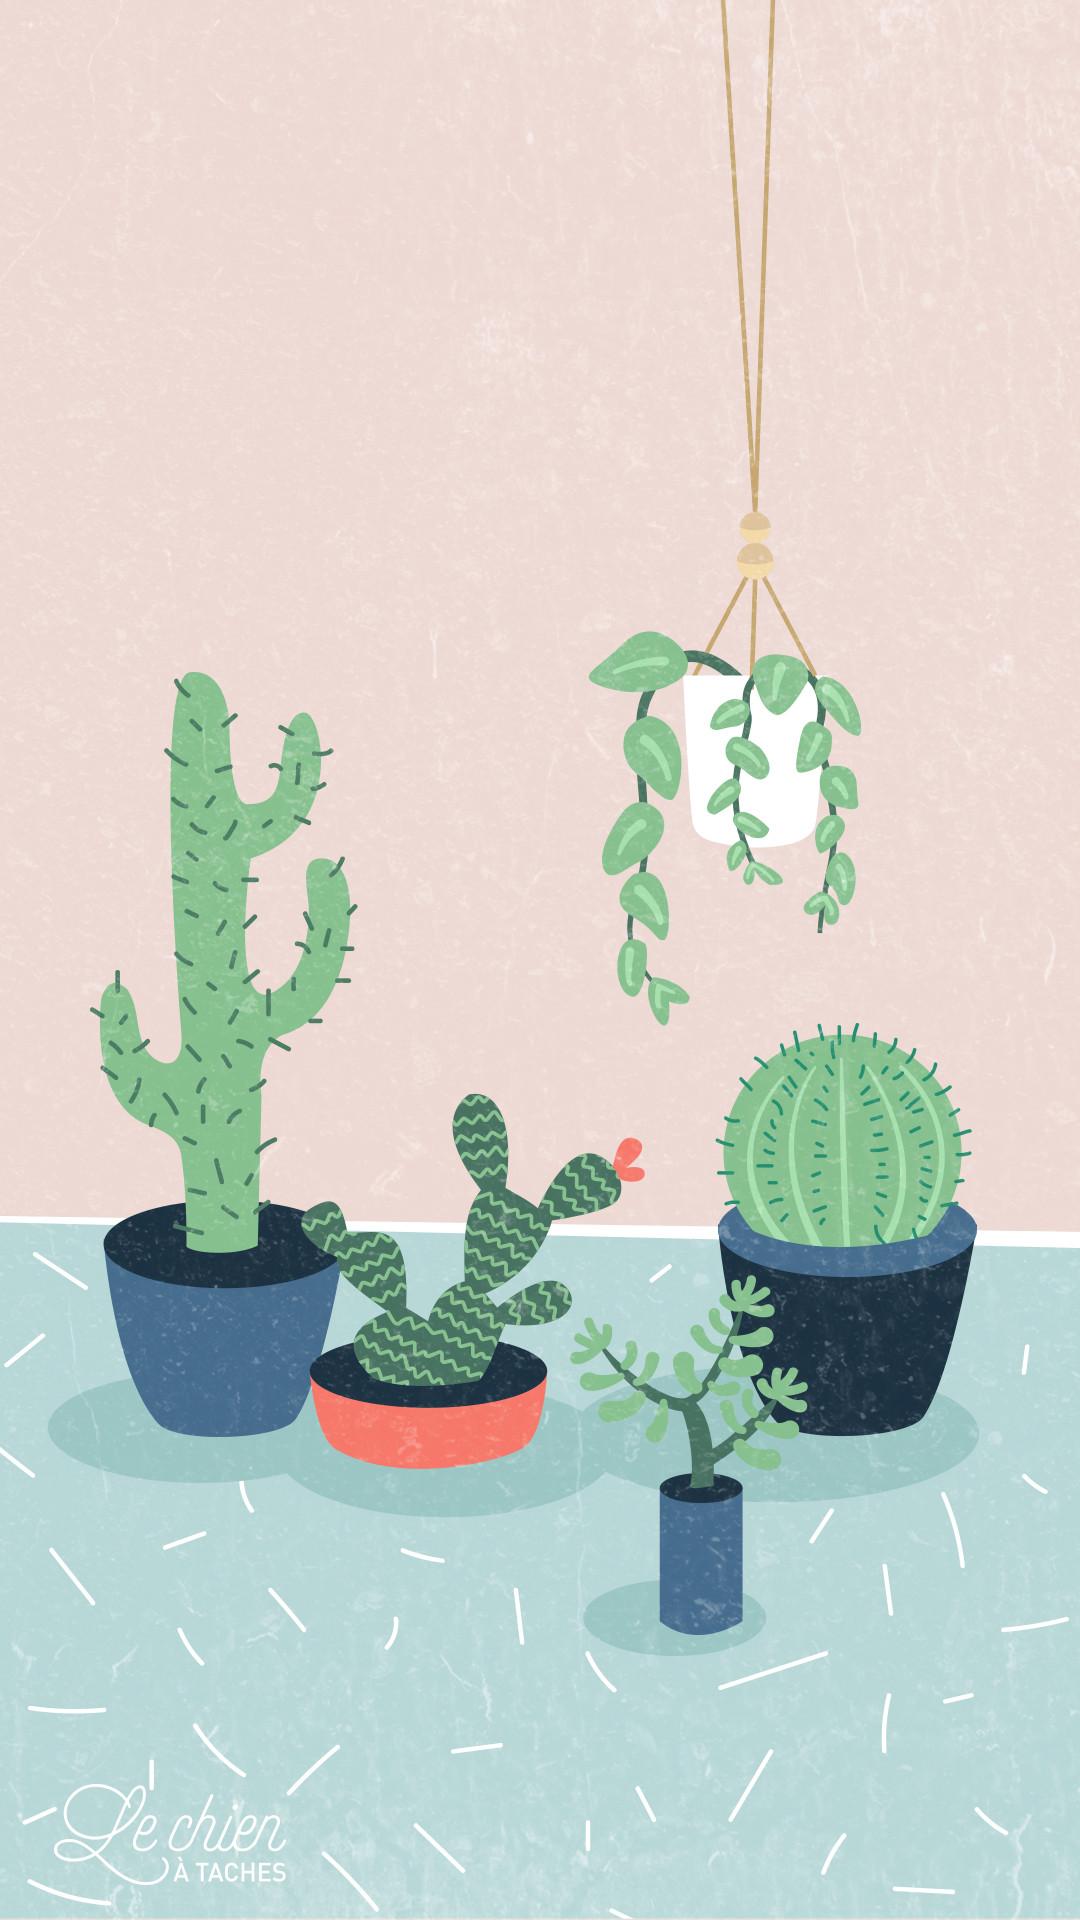 Iphone 7 Wallpaper Adorable Cactus Wallpaper